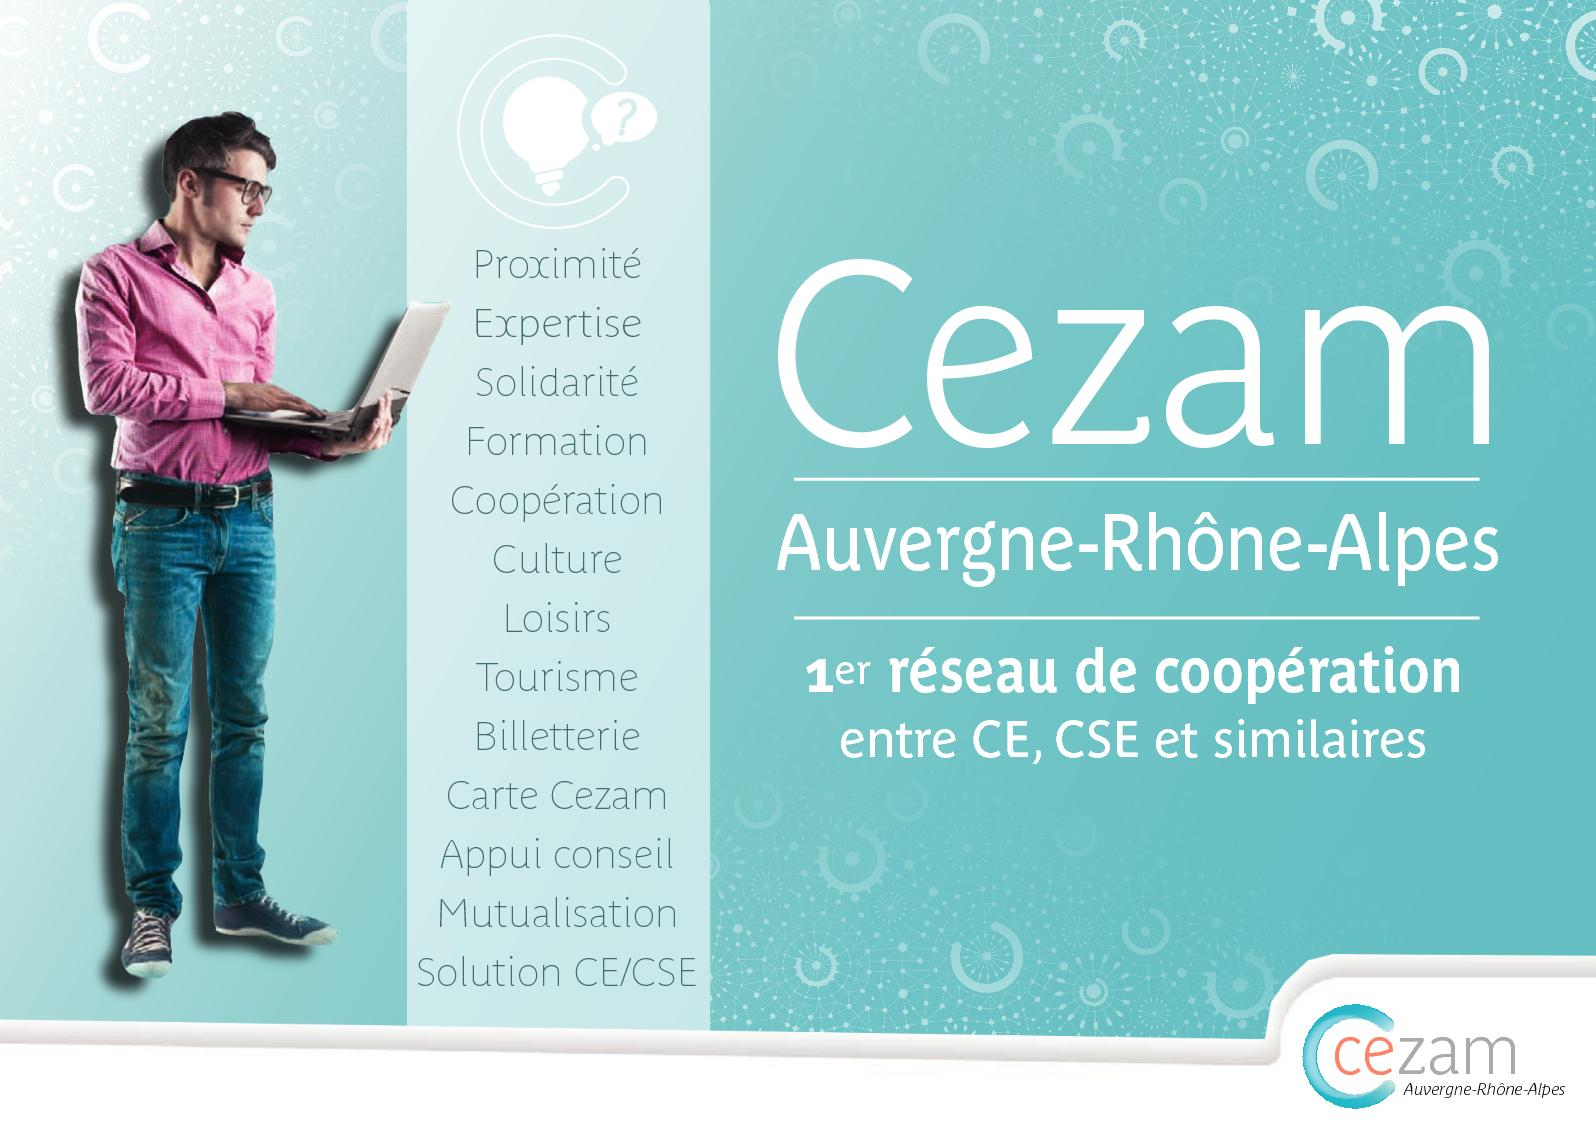 Carte Cezam Conjoint.P Calameoassets Com 180322113516 381c05f1ab61446d1